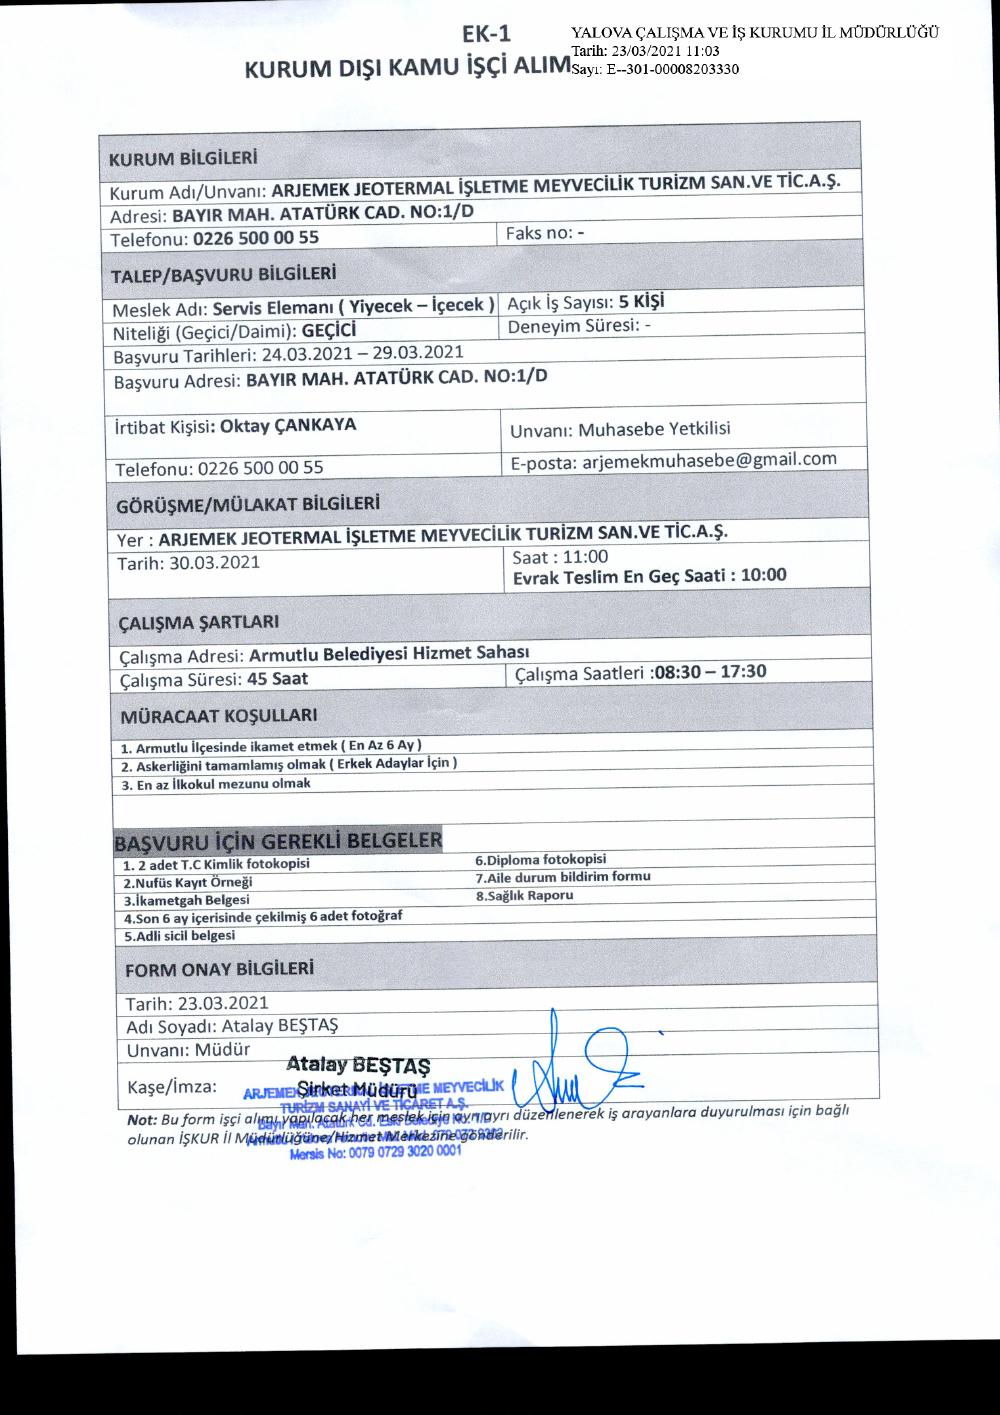 yalova-arjemek-jeotermal-isl-meyv-turz-san-tic-a-s-29-03-2021-000001.png